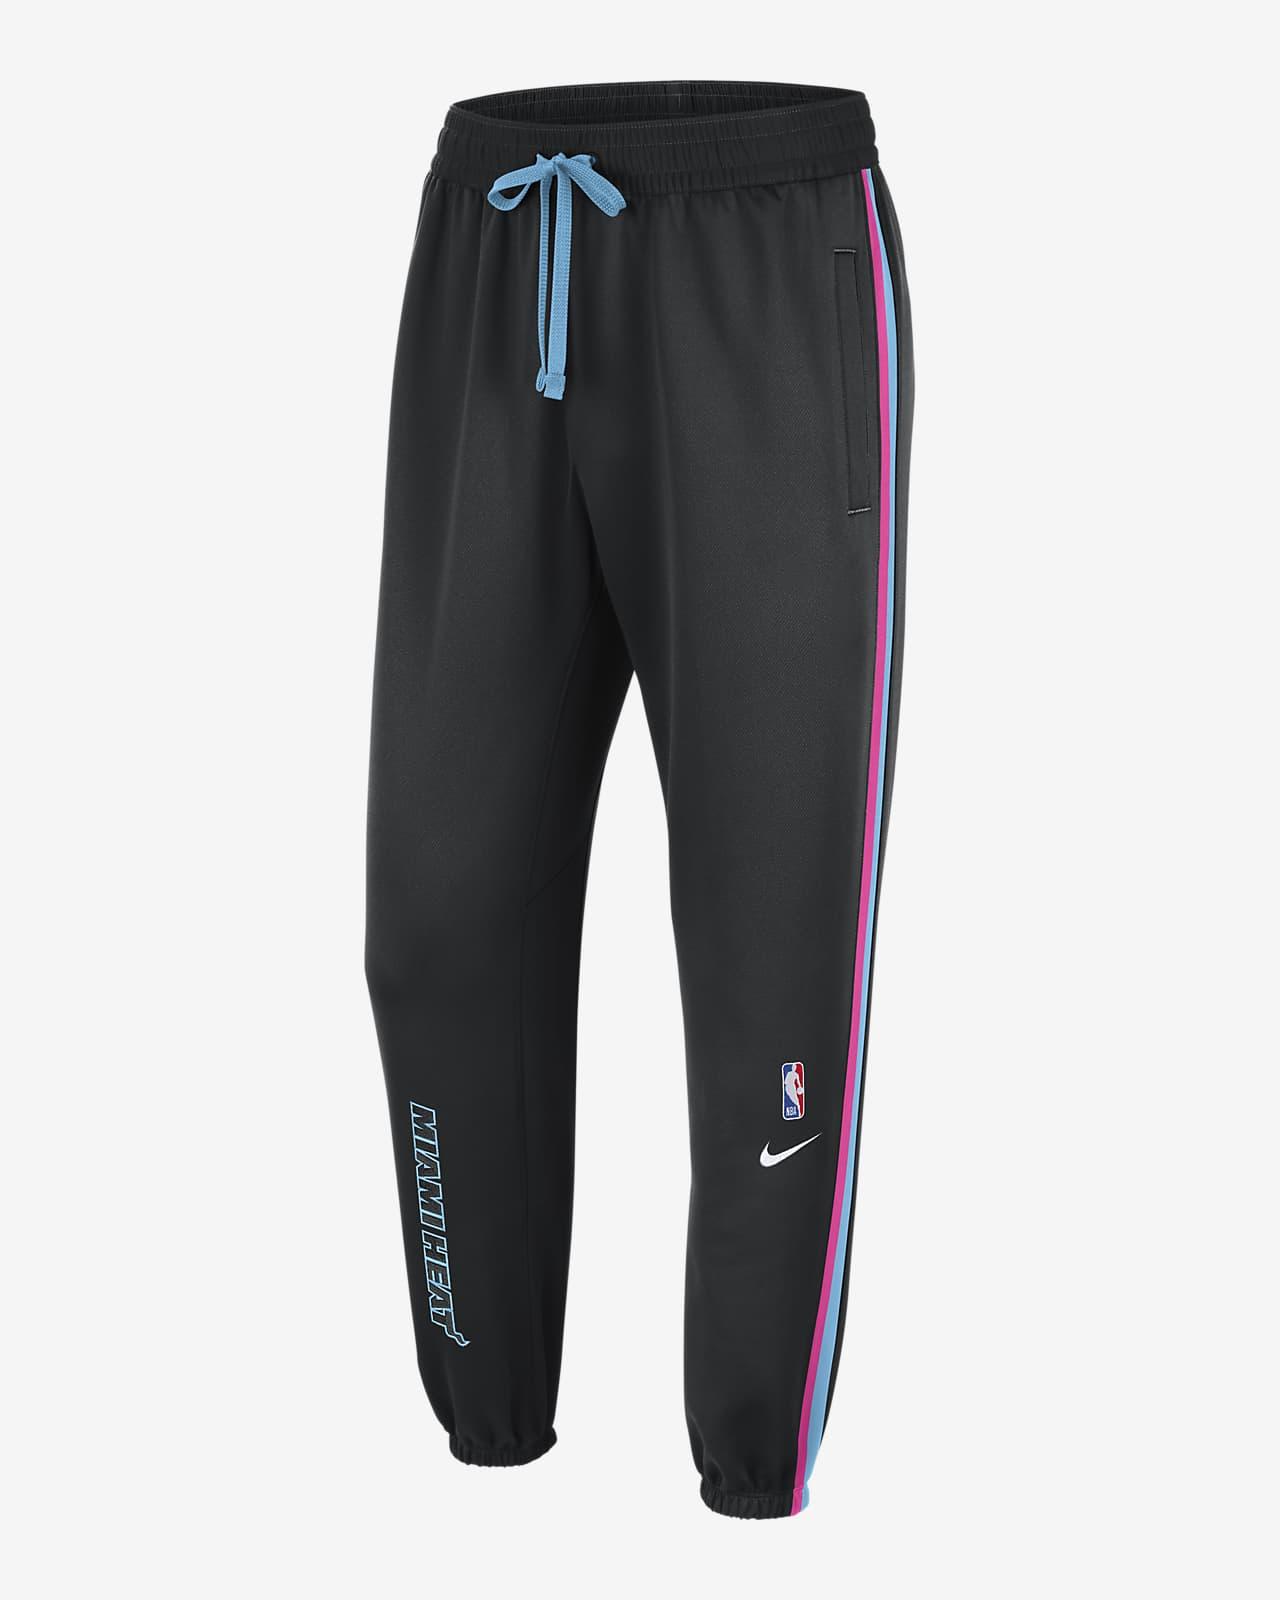 Miami Heat Showtime City Edition Men's Nike Therma Flex NBA Trousers